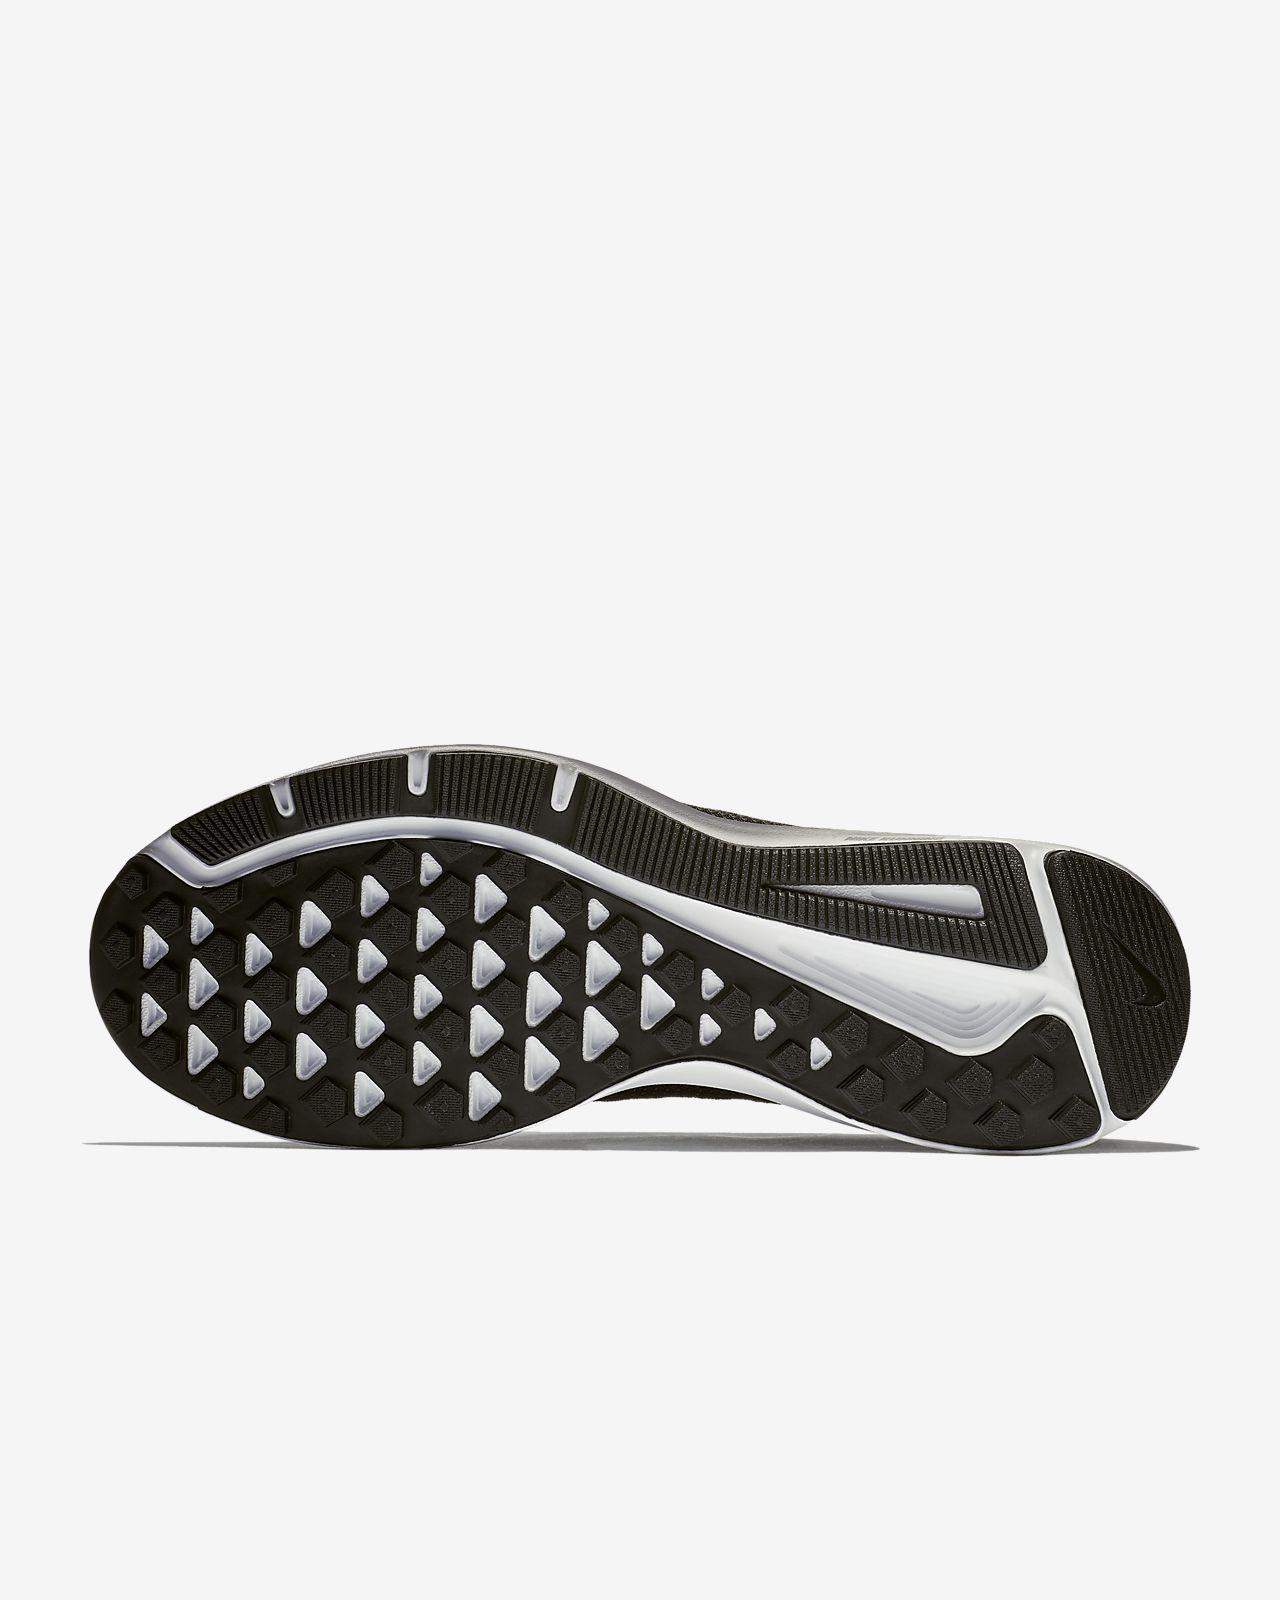 quality design 7765b 2062c ... Chaussure de running Nike Quest pour Homme